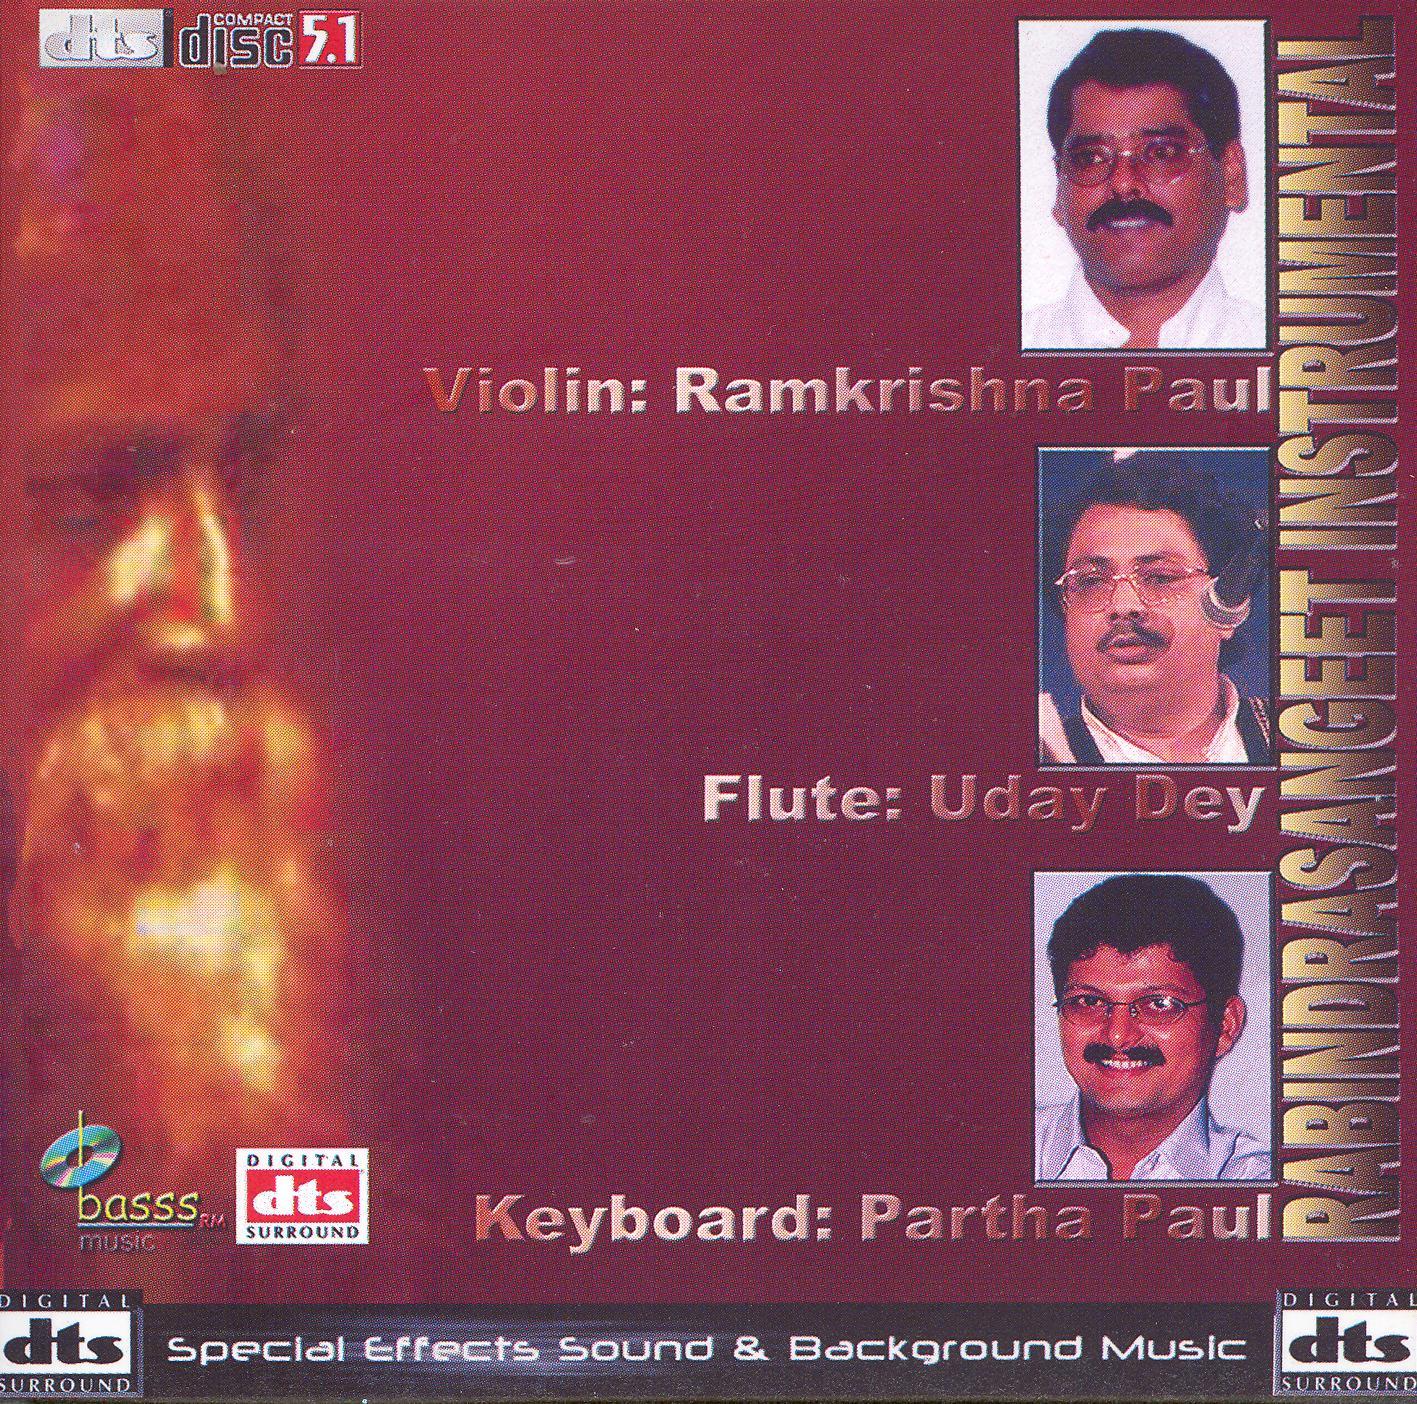 Ramkrishna Paul/Uday Dey/Partha Paul: Rabindrasangeet Instrumental